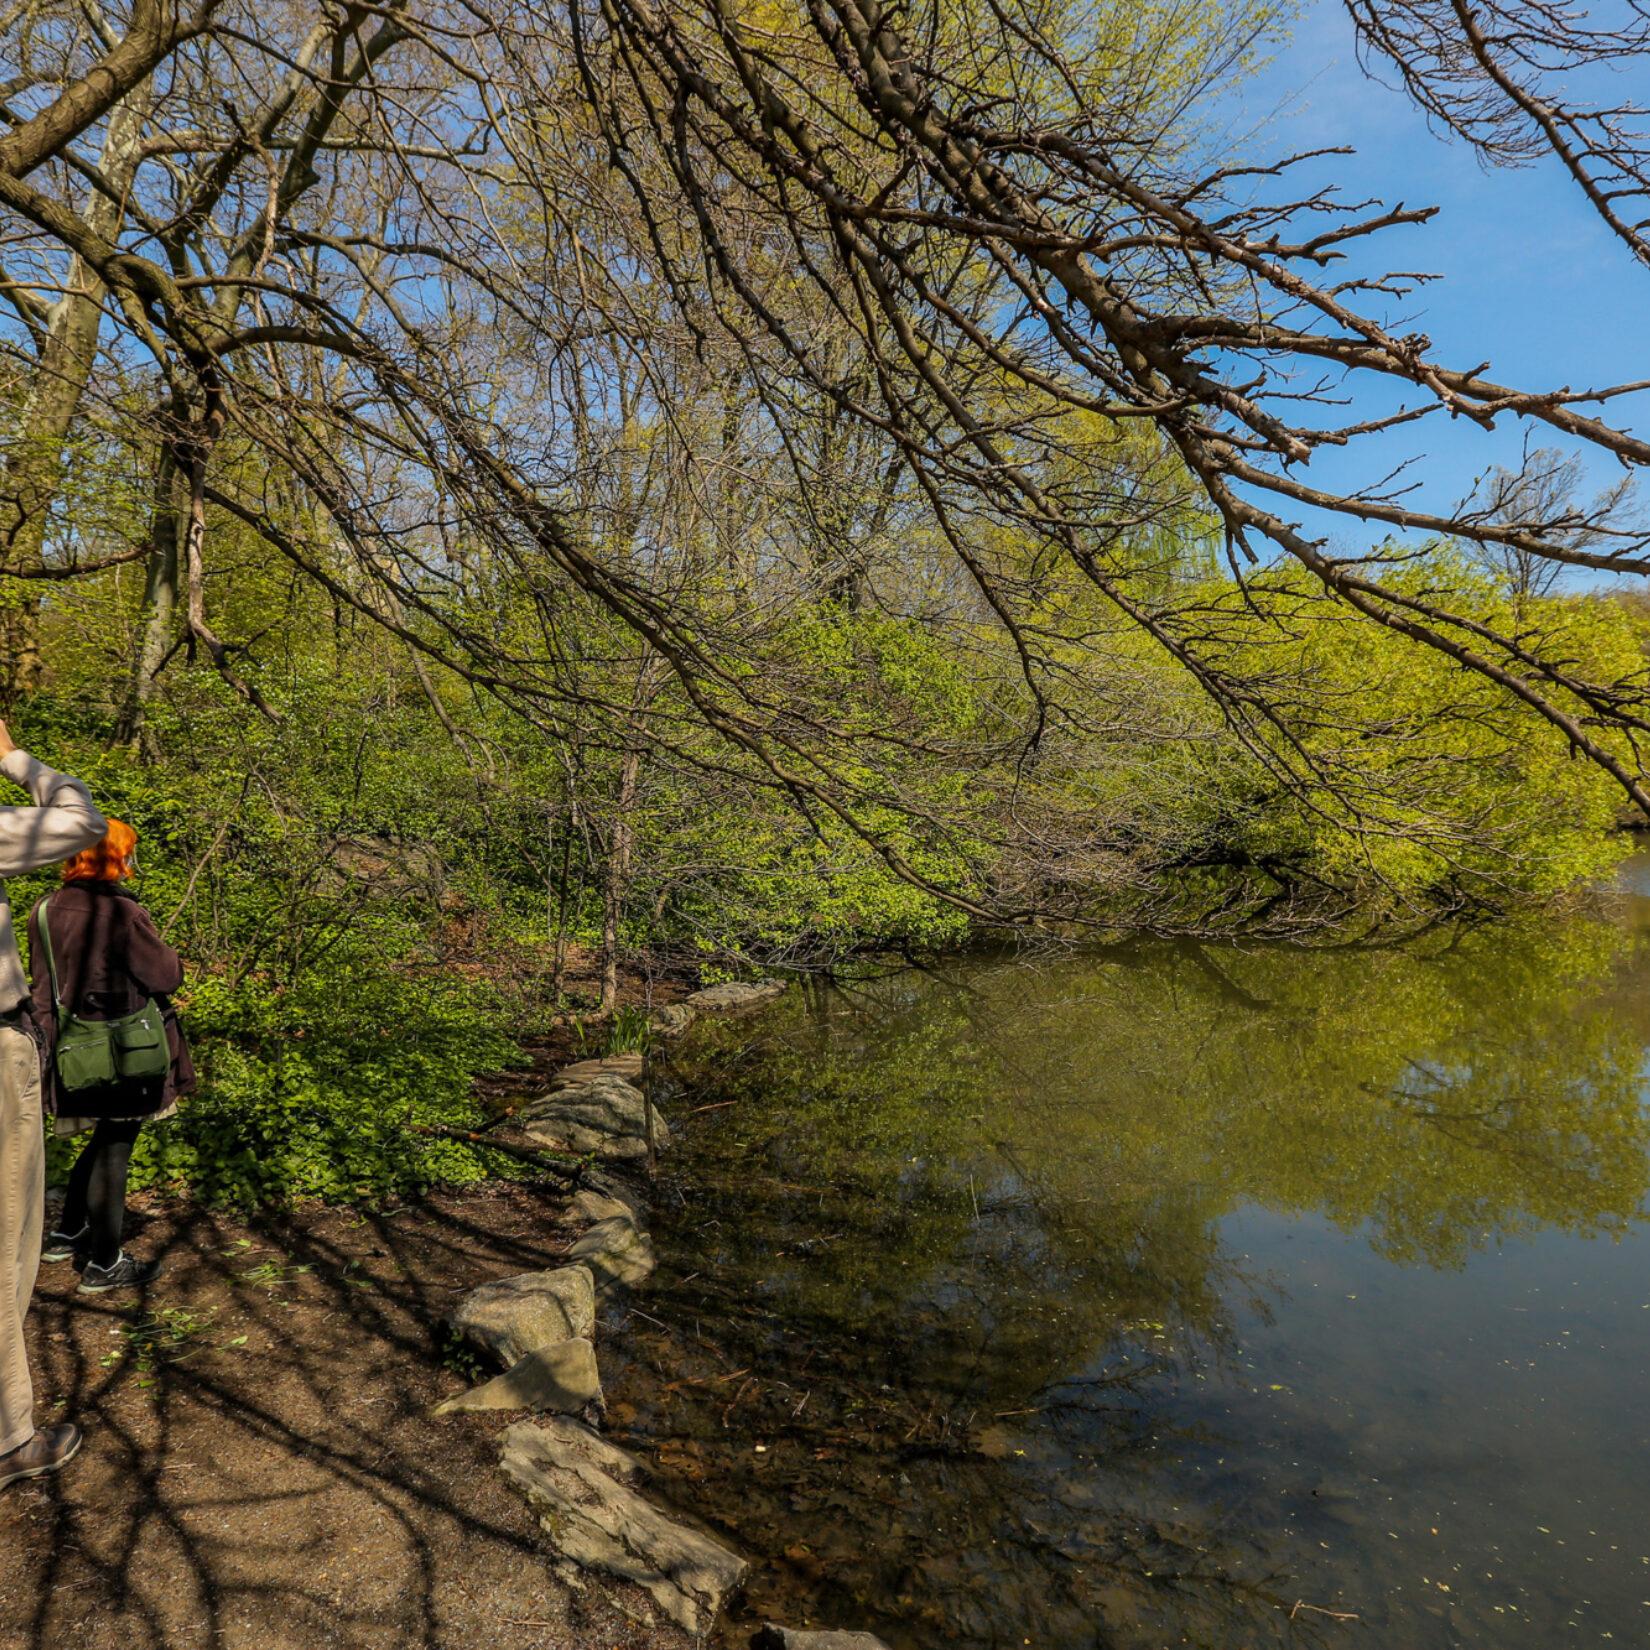 A birder using binoculars on the shore of the Lake